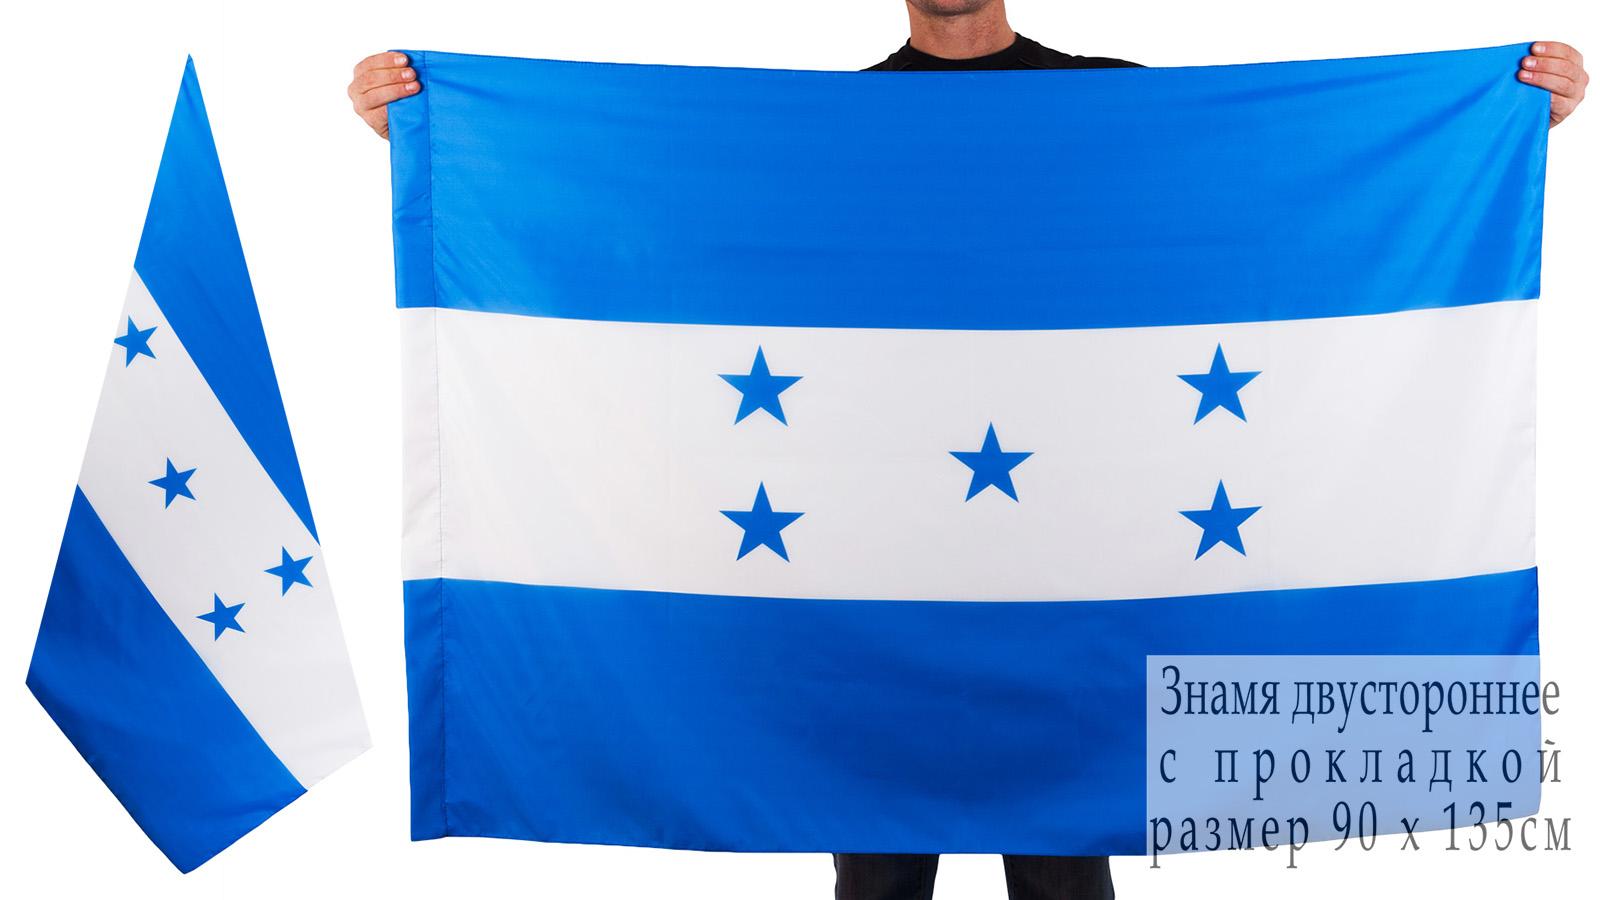 Государственный флаг Гондураса